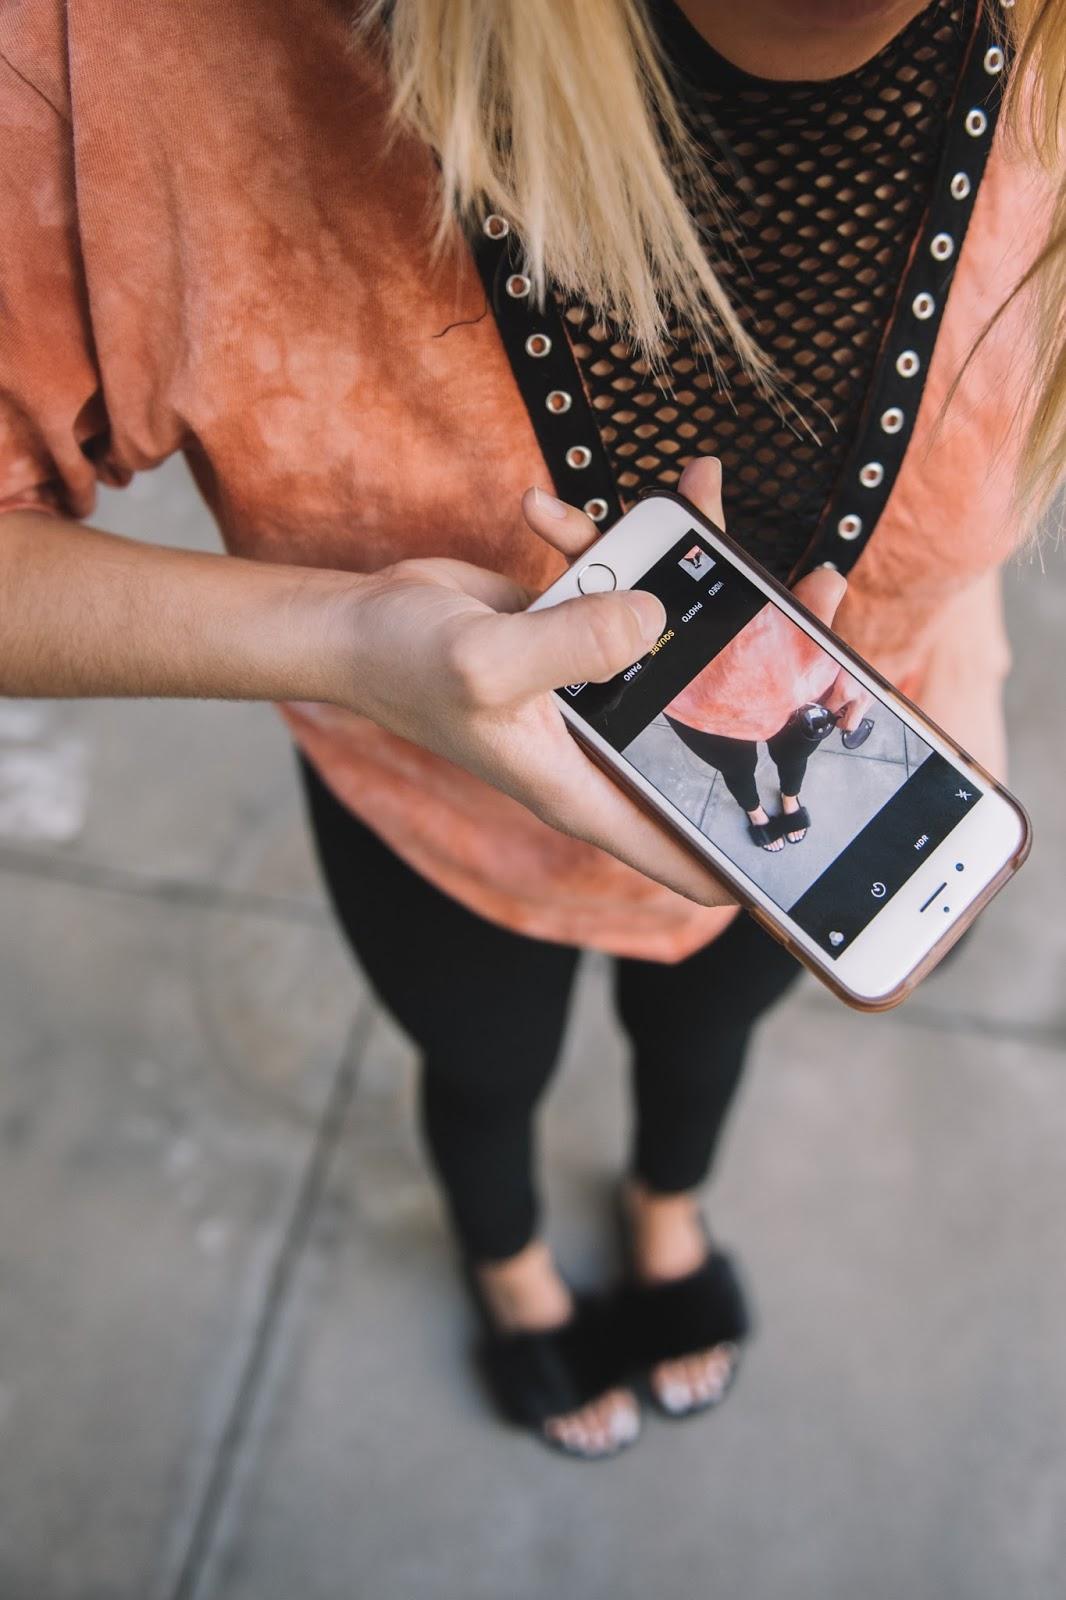 Urban Outfitters Fur Slides - @ taylorwinkelmeyer